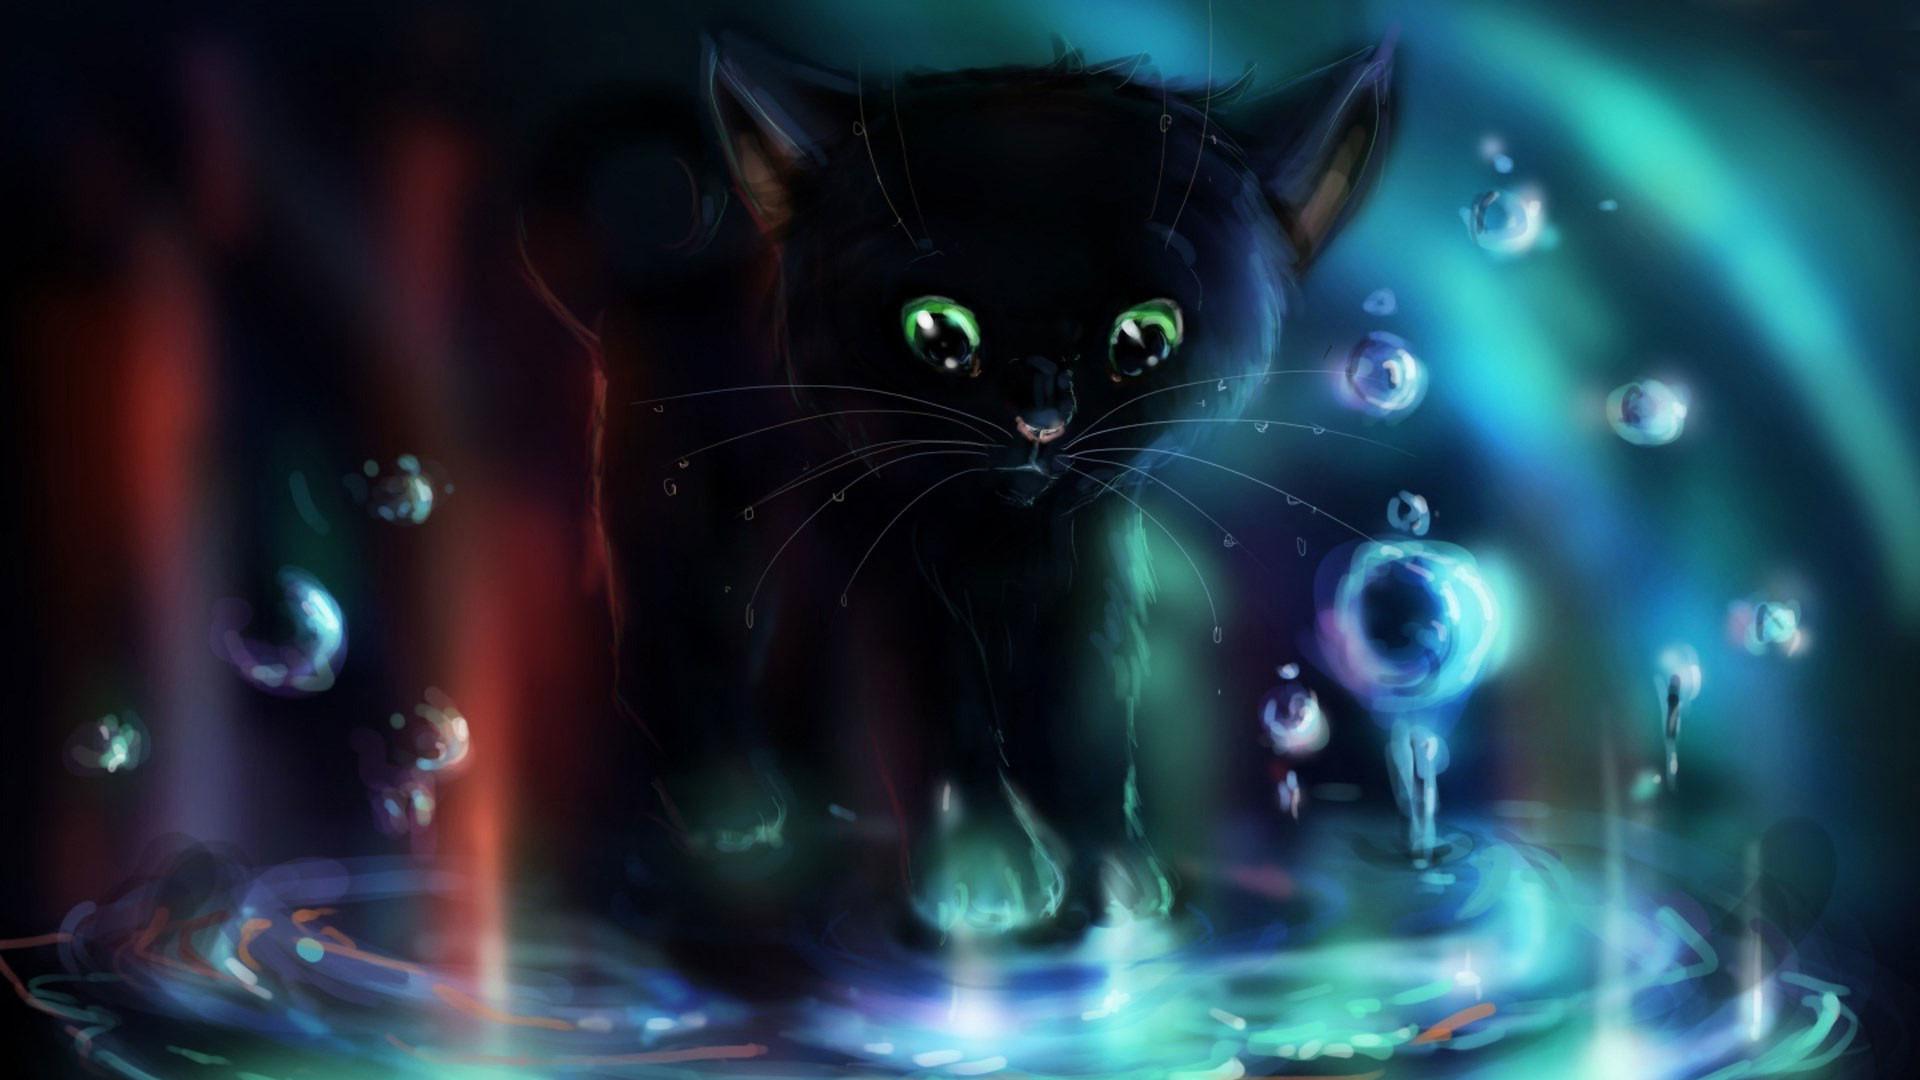 hd pics photos attractive black cat water 2d animated cartoon hd quality desktop  background wallpaper